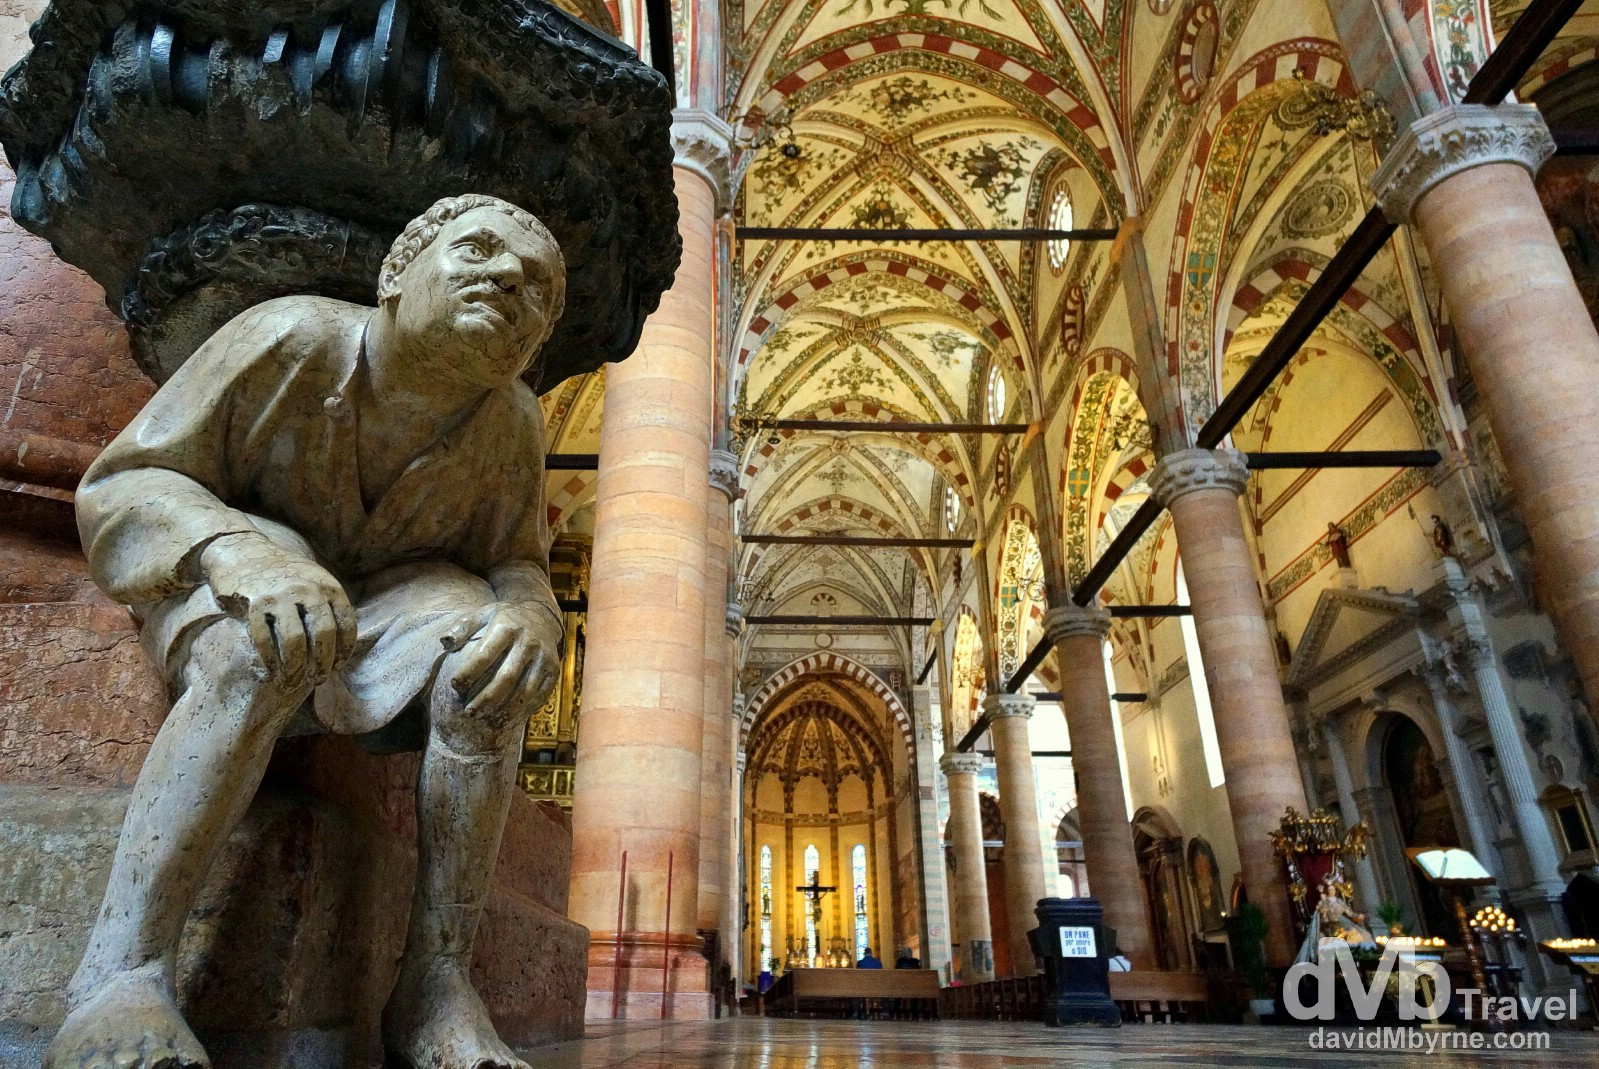 The interior of the Church of Saint Anastasia in Verona, Italy. March 17, 2014.